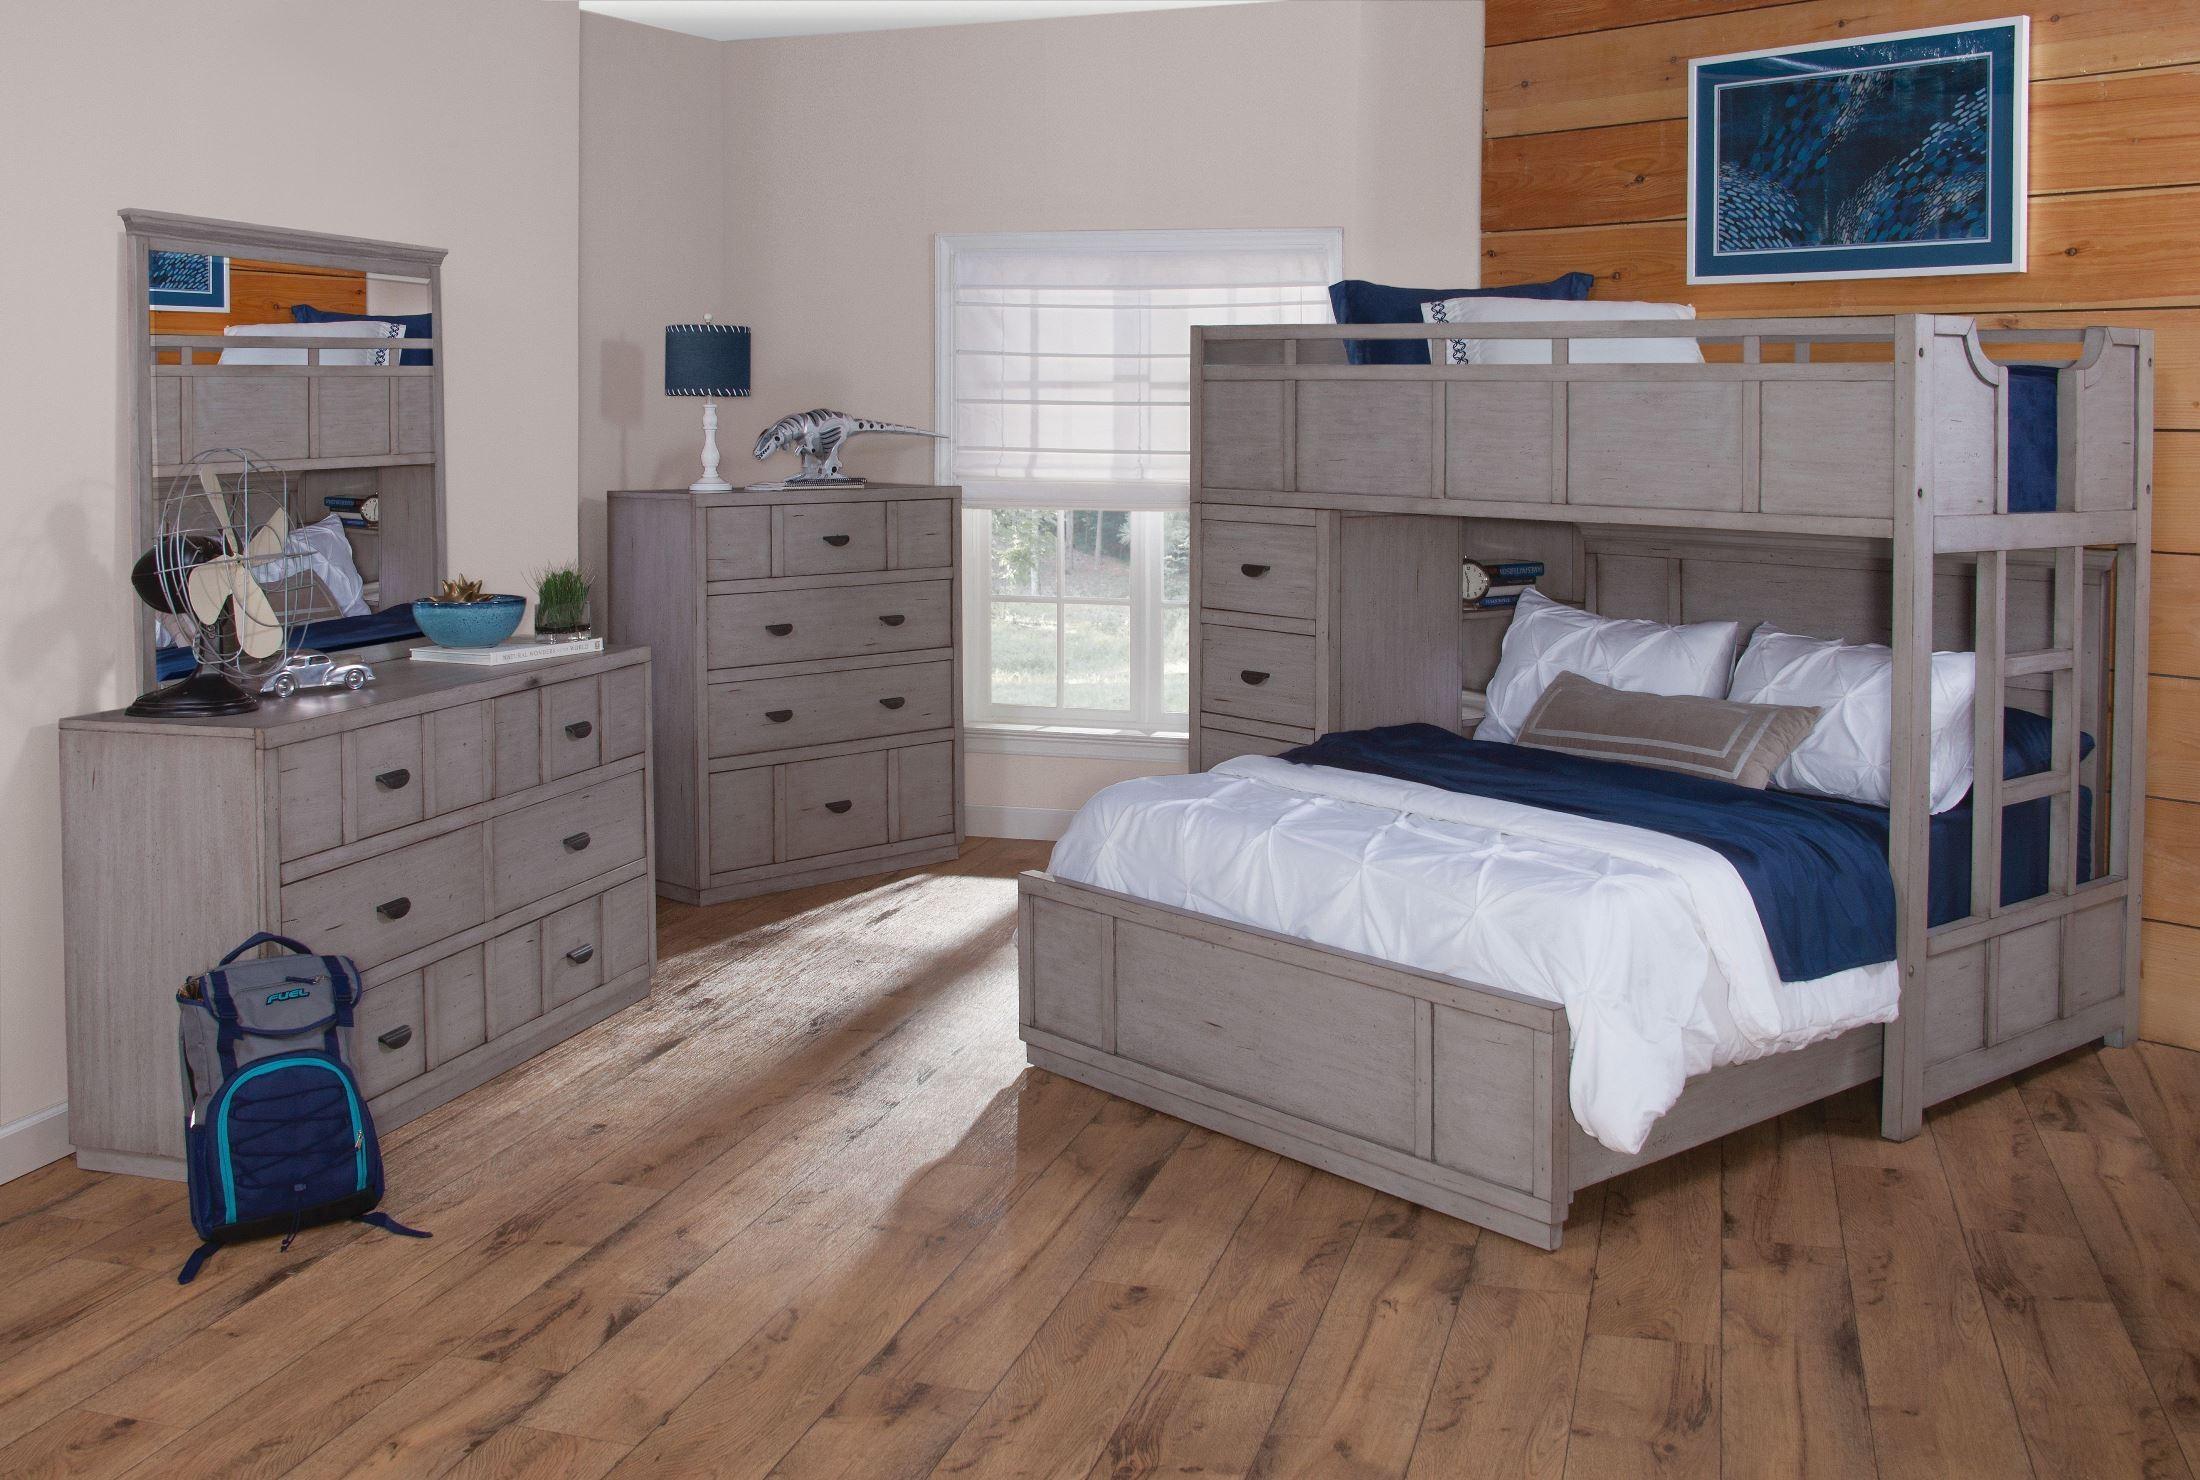 Provo Driftwood Patina Loft Bedroom Set, 7300-345-915-969-945-946 ...